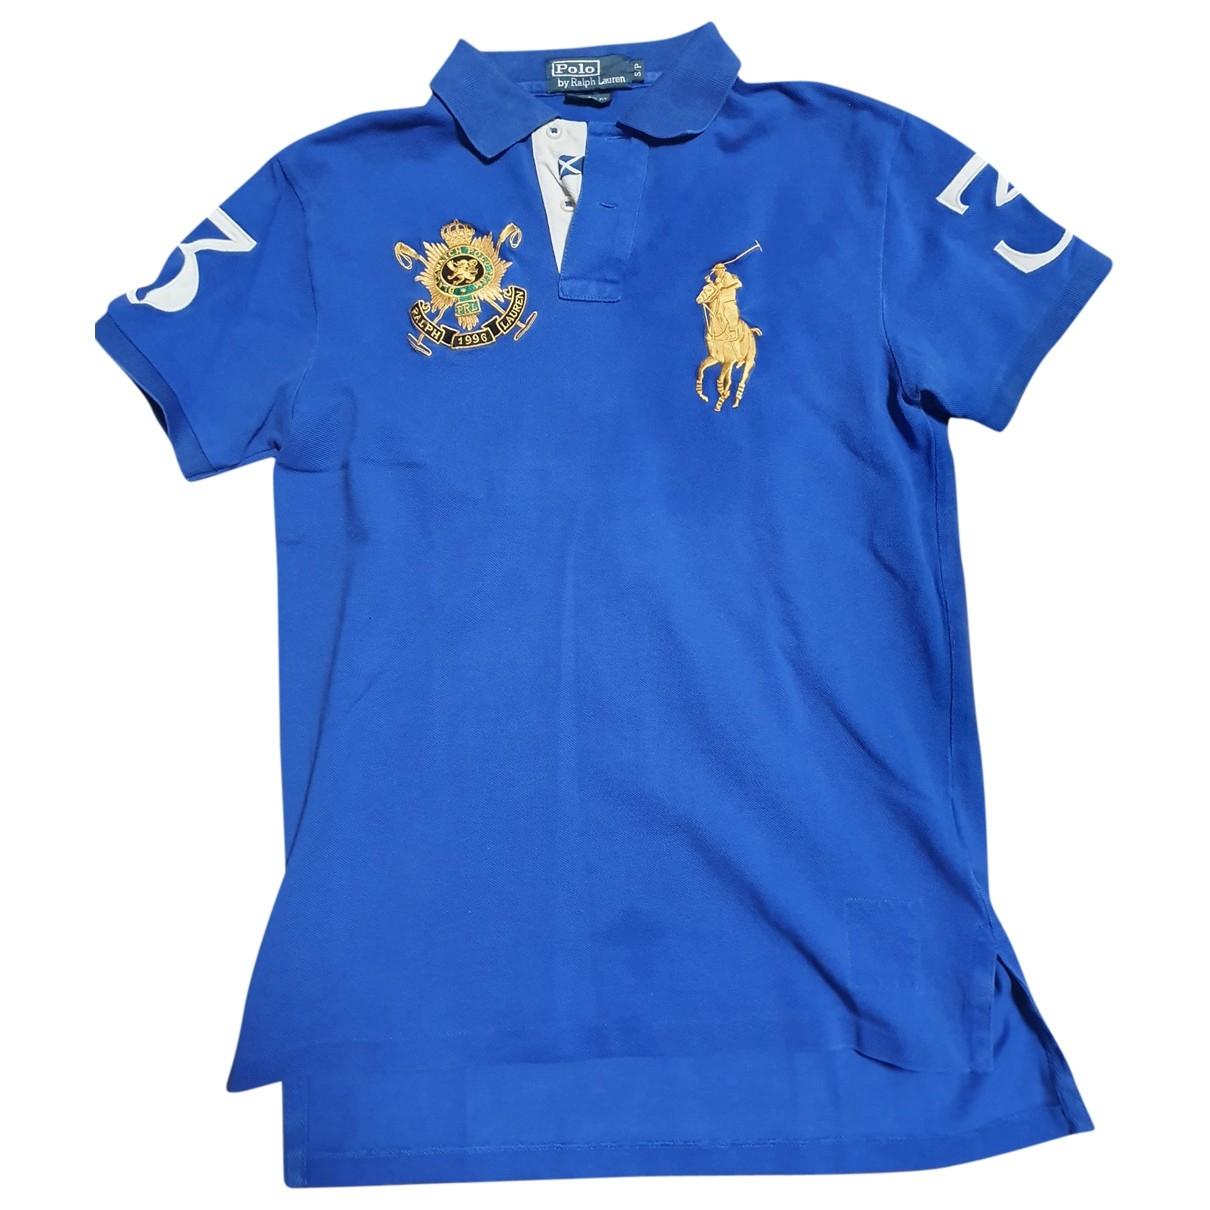 Polo Ralph Lauren \N Blue Cotton T-shirts for Men S International